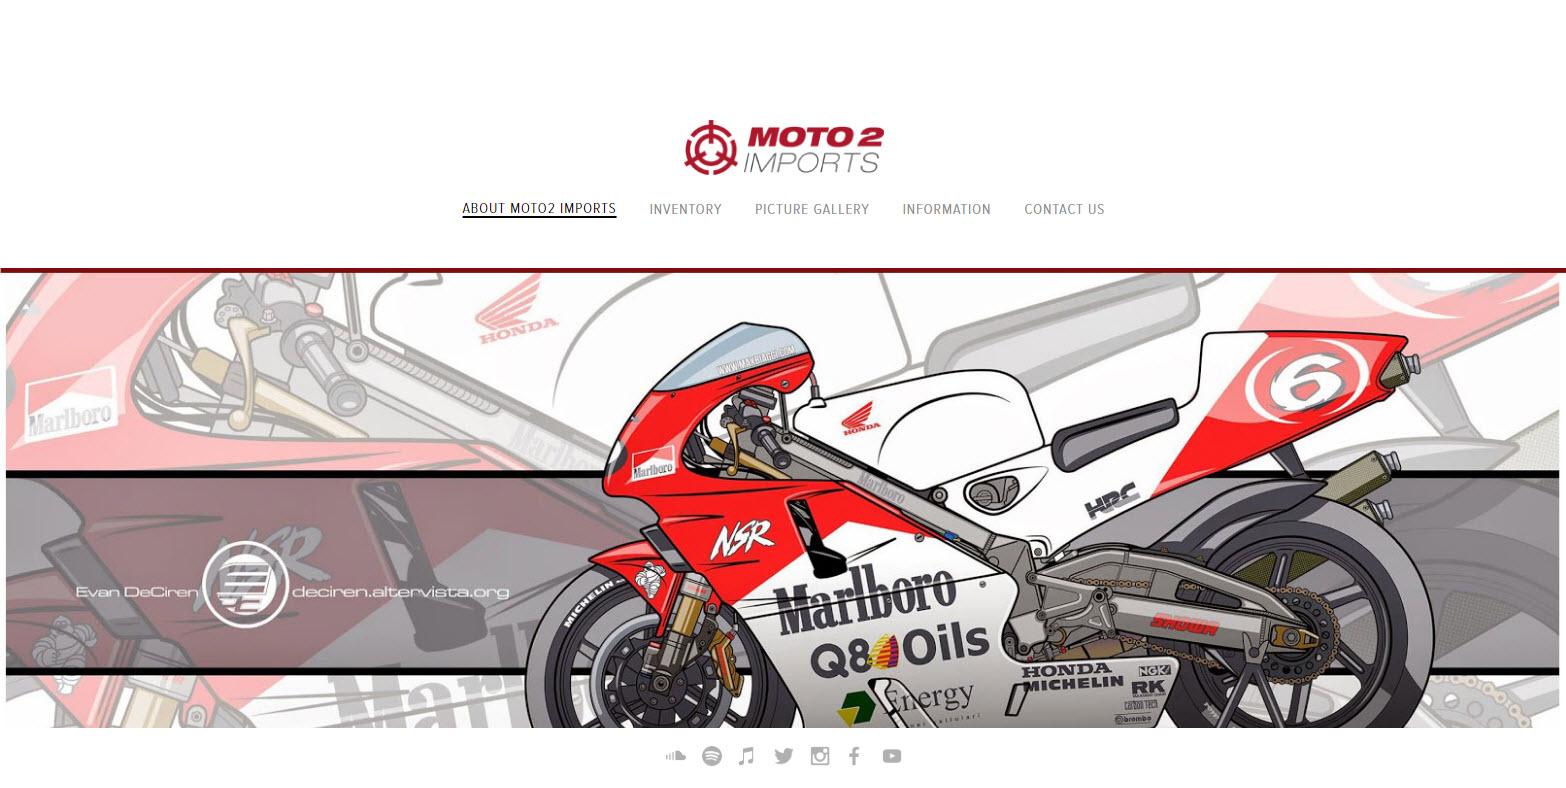 moto2imports.com